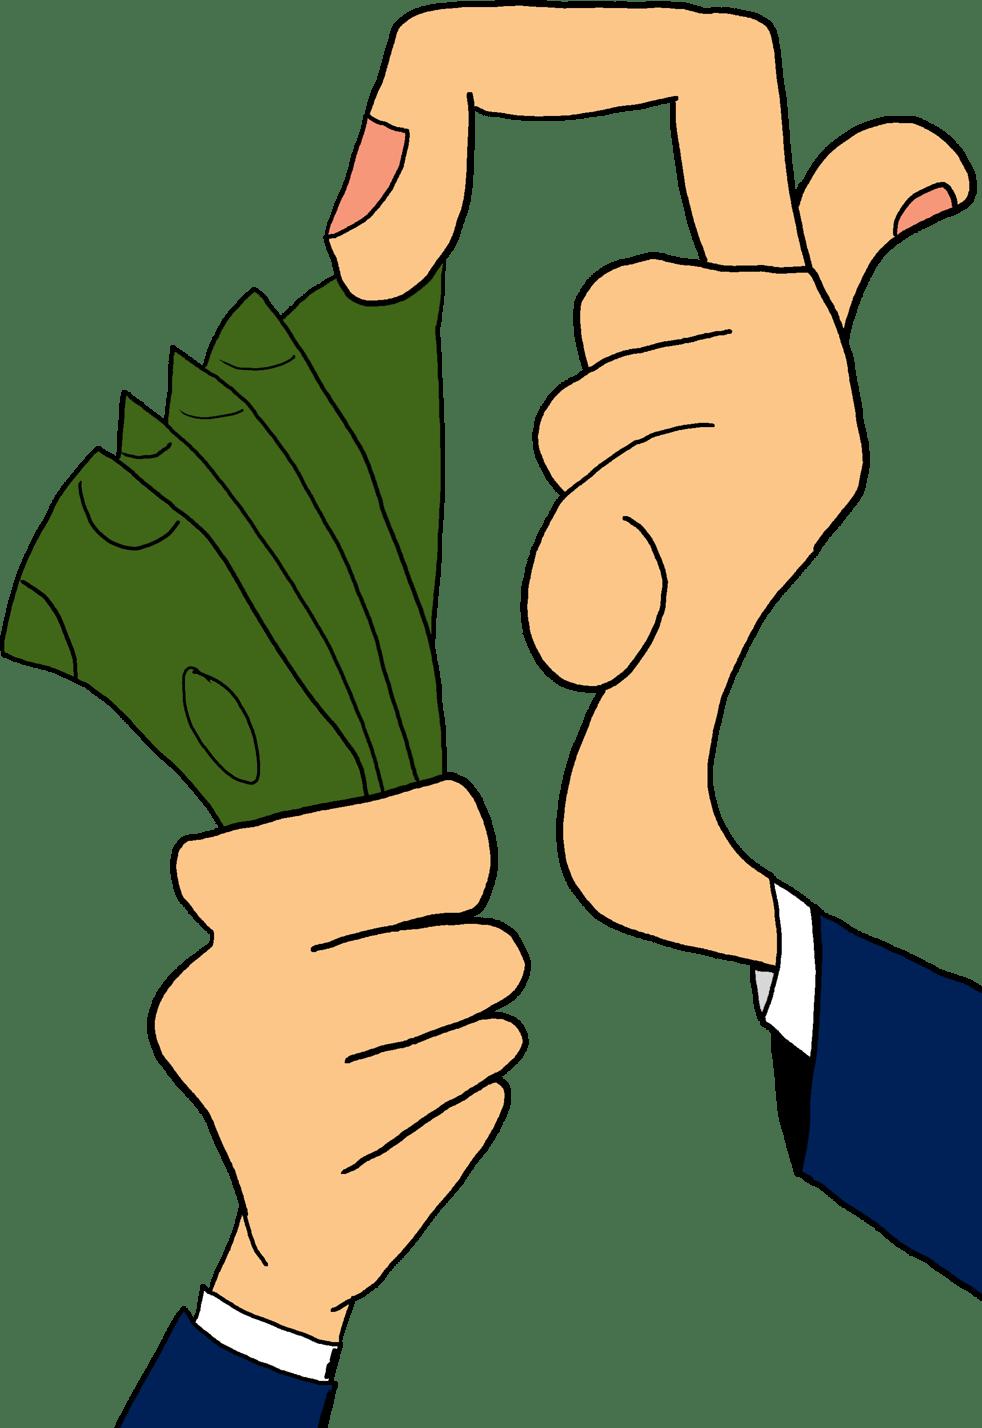 Money clipart offer. Show me the bladenomics